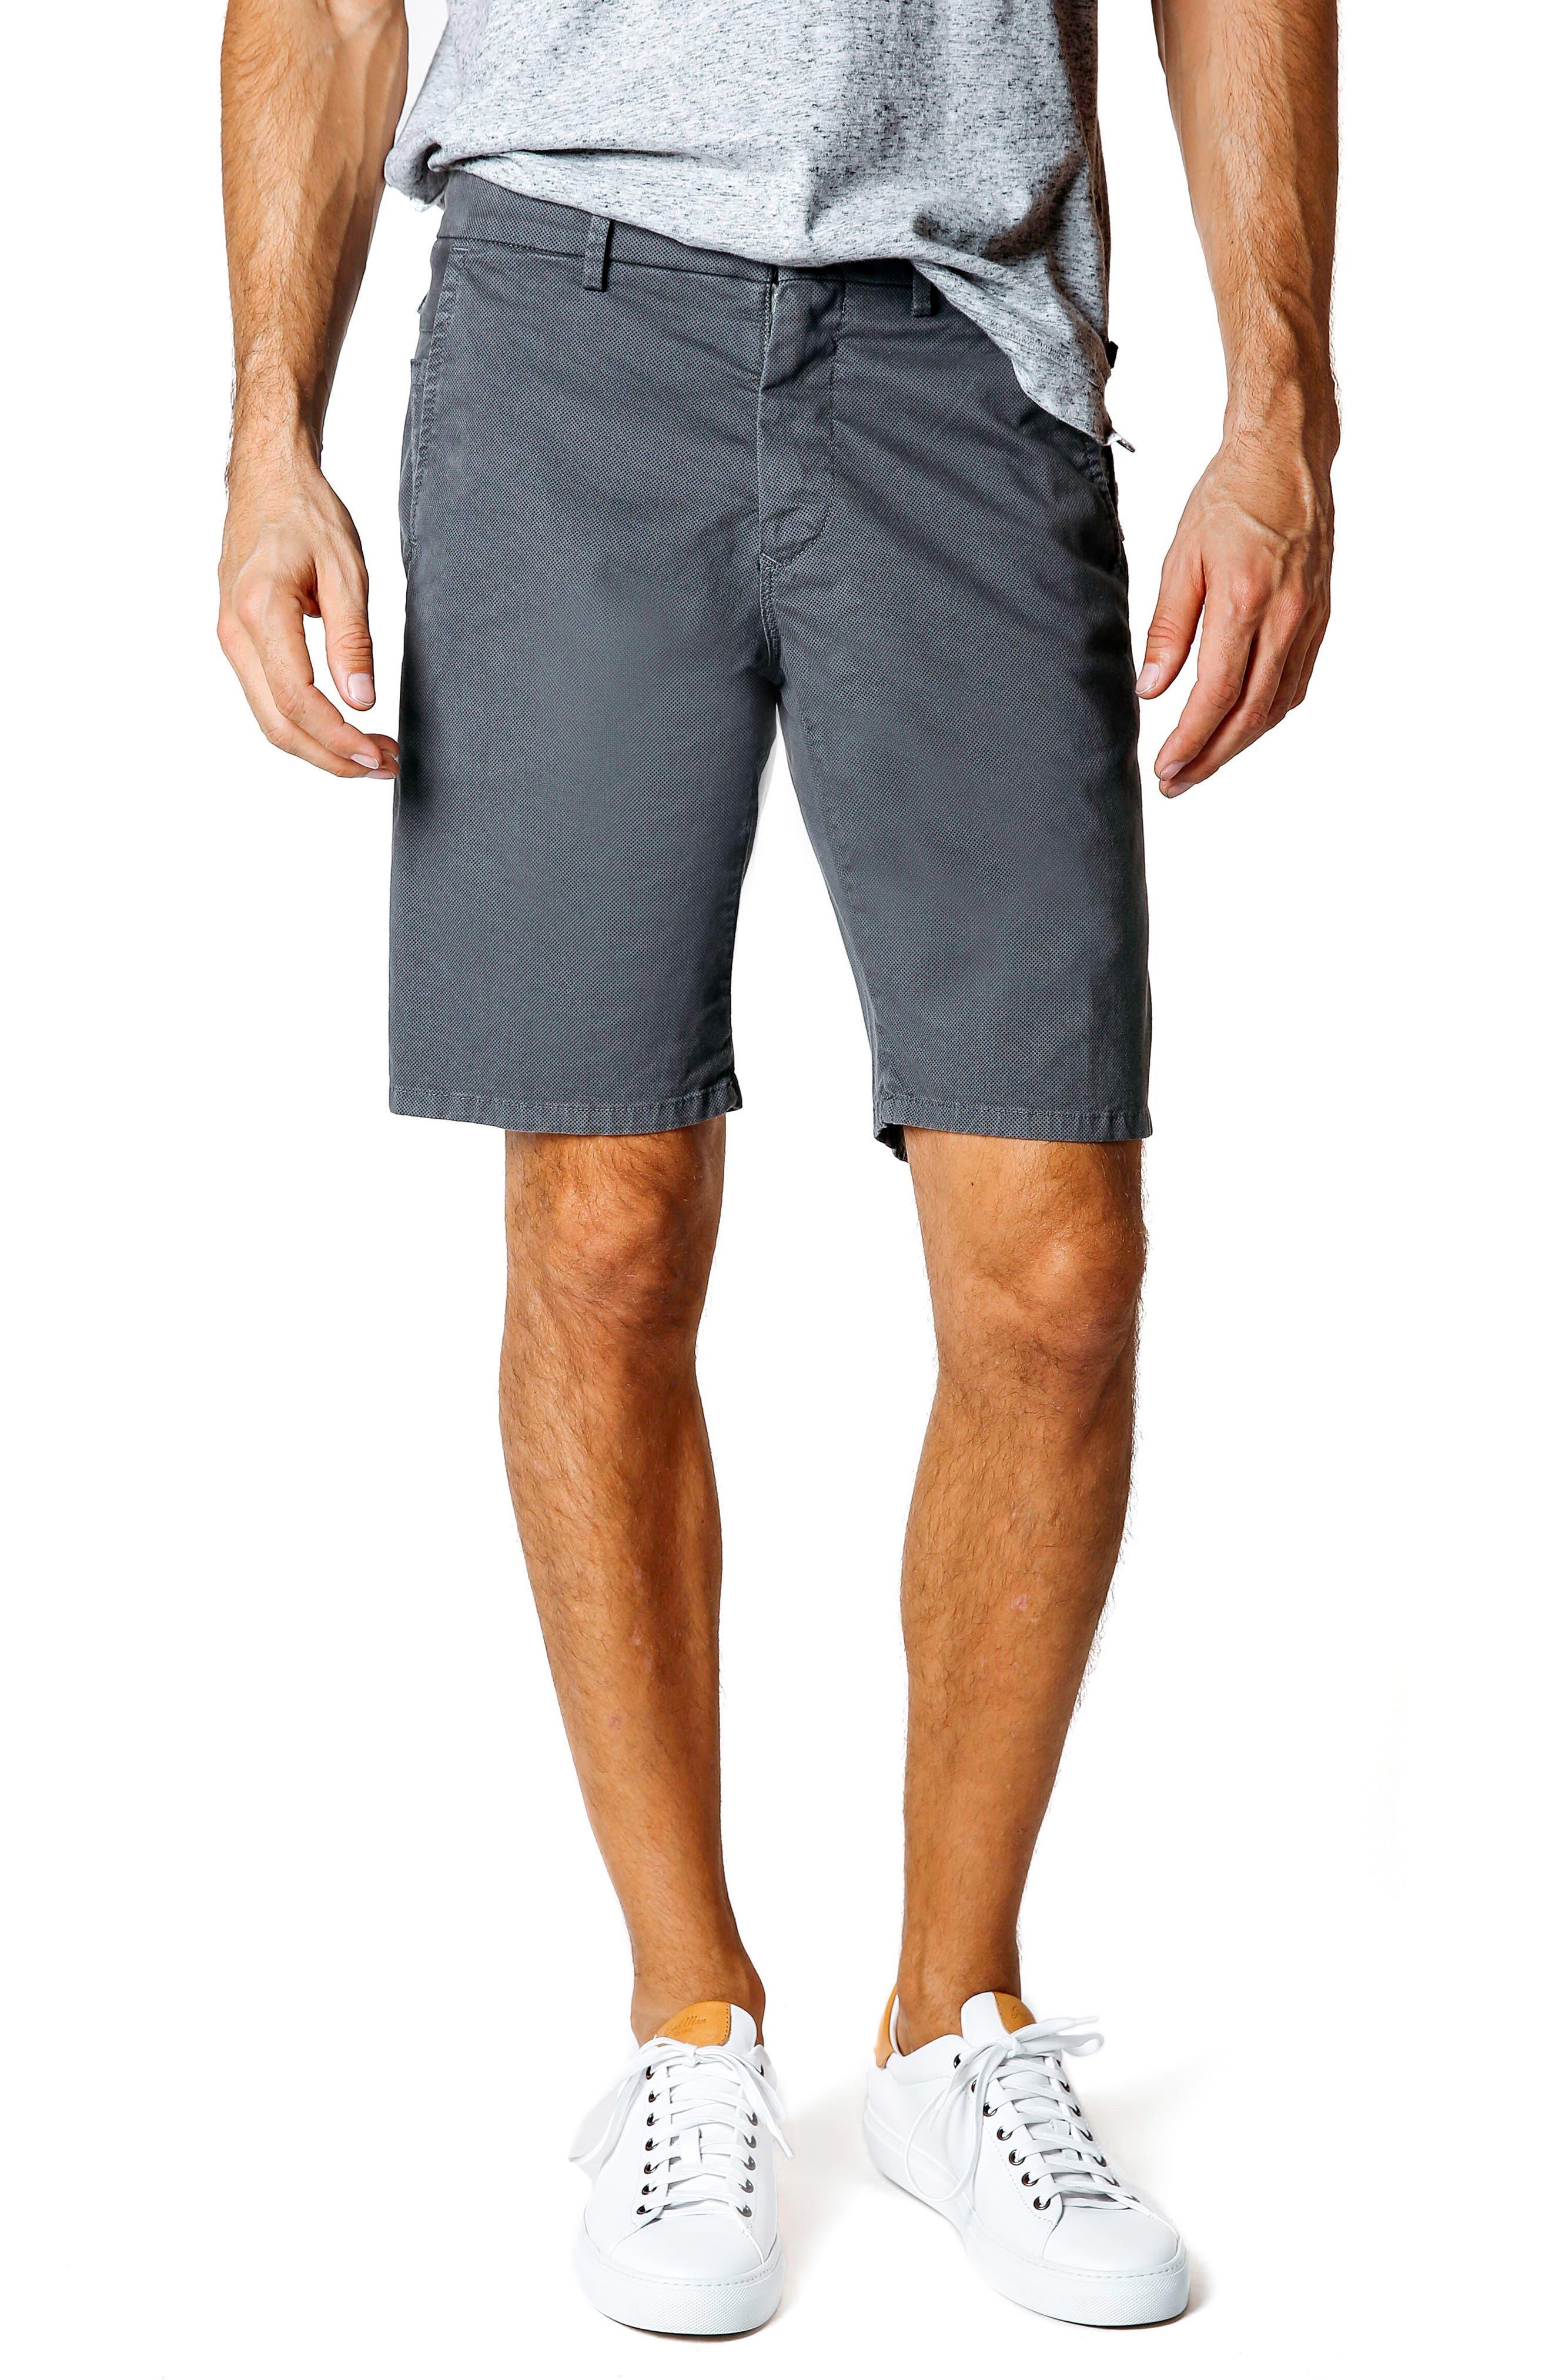 Wrap Microdot Stretch Chino Shorts,                             Main thumbnail 1, color,                             Magnet